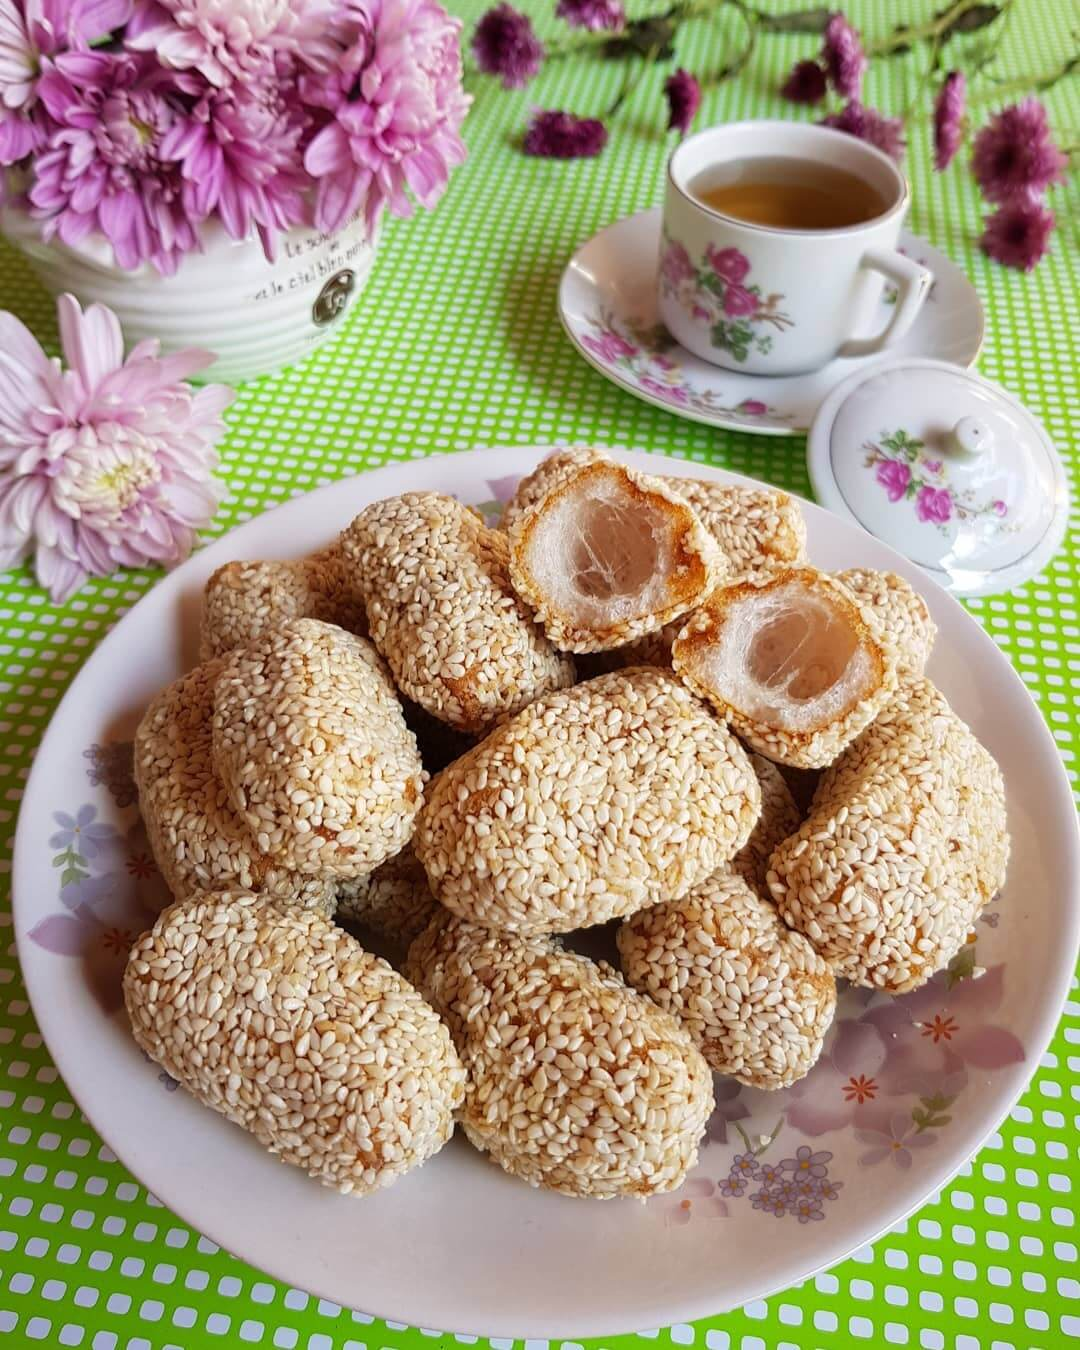 kue manco makanan ringan manis khas madiun